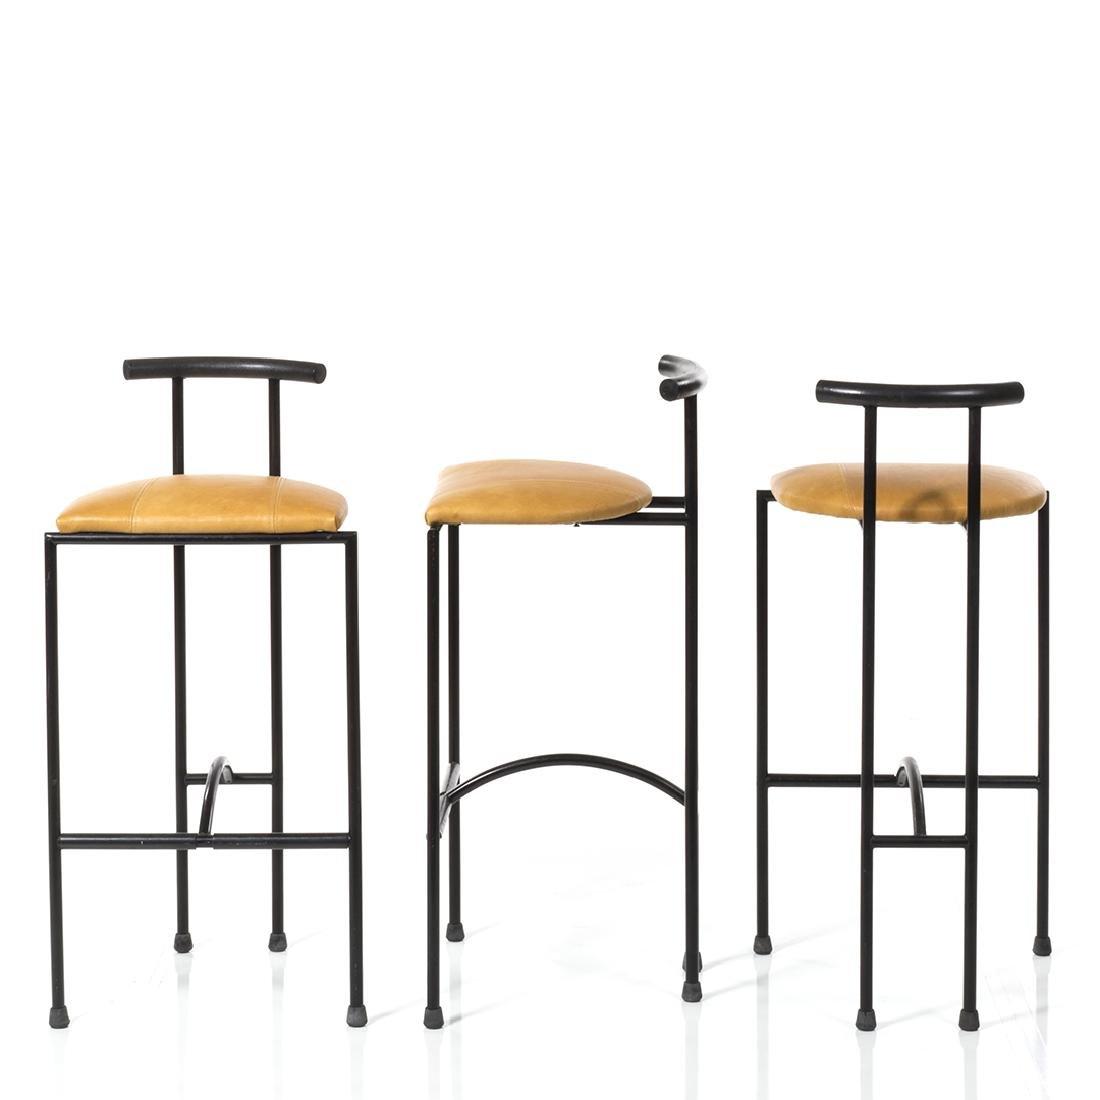 Rodney Kinsman Tokyo Barstools (3) - 2